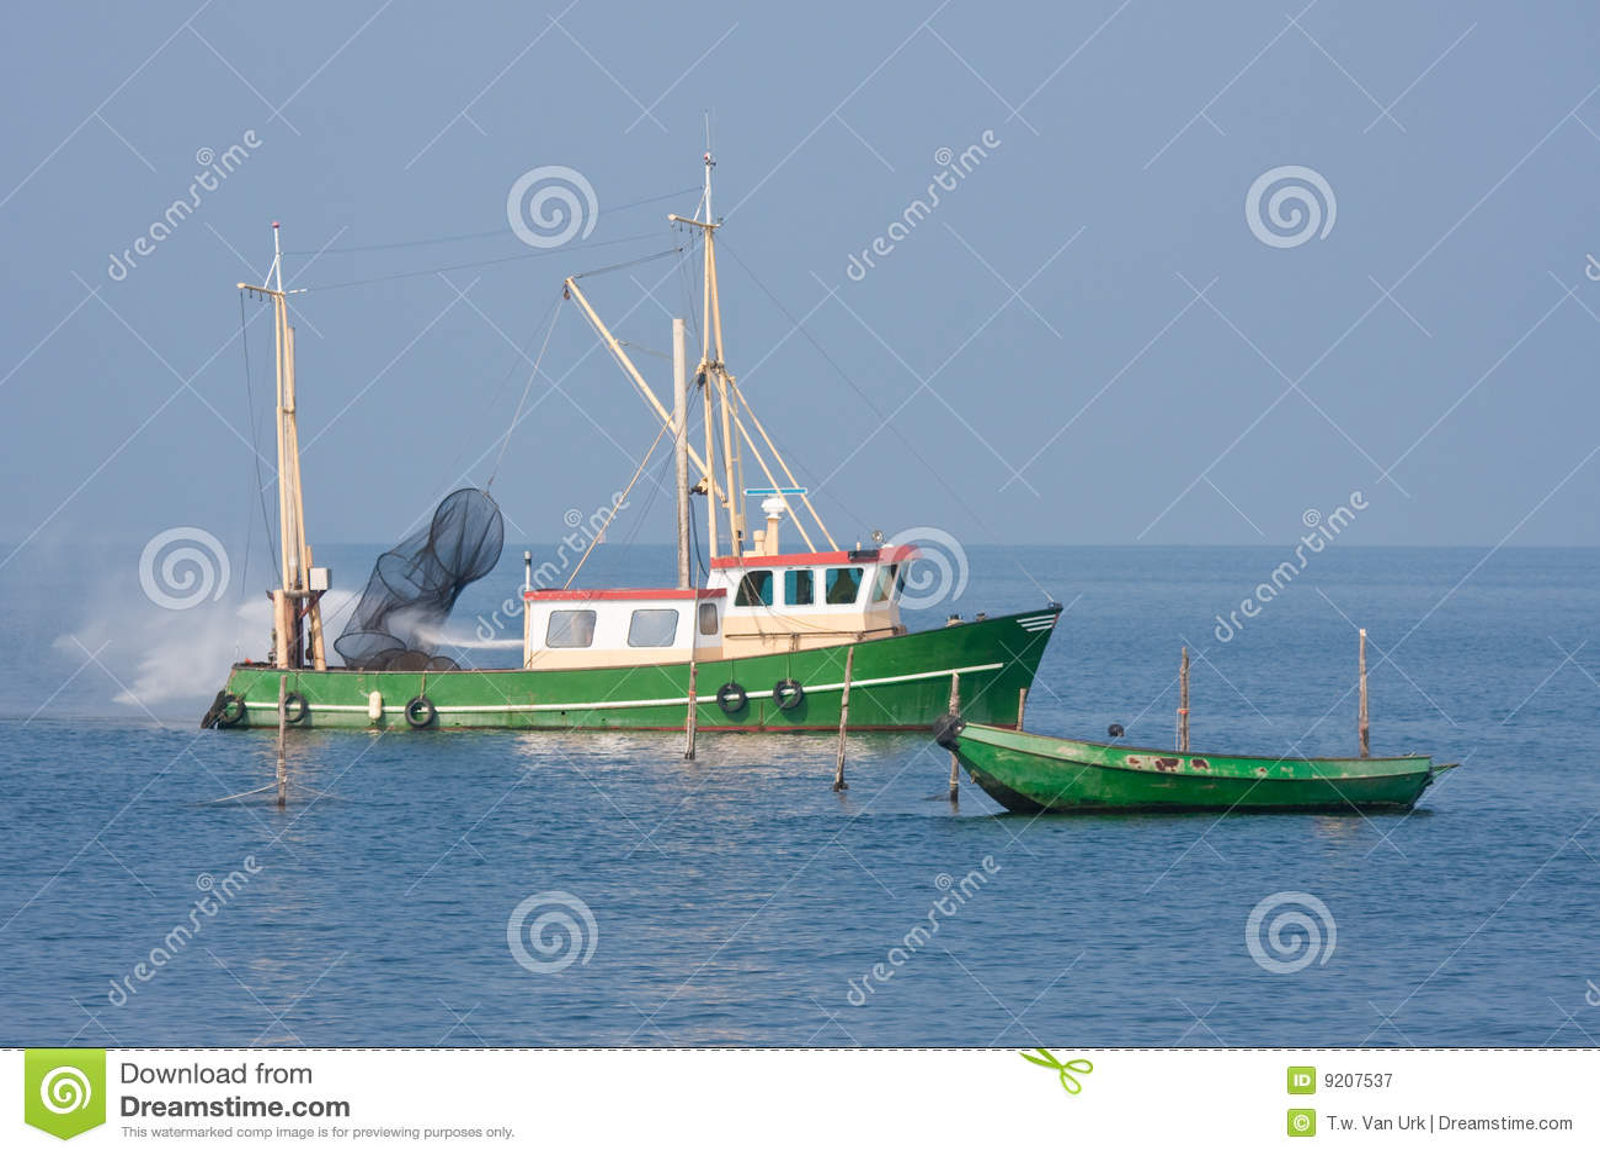 fishing boat prow of abundance how to make